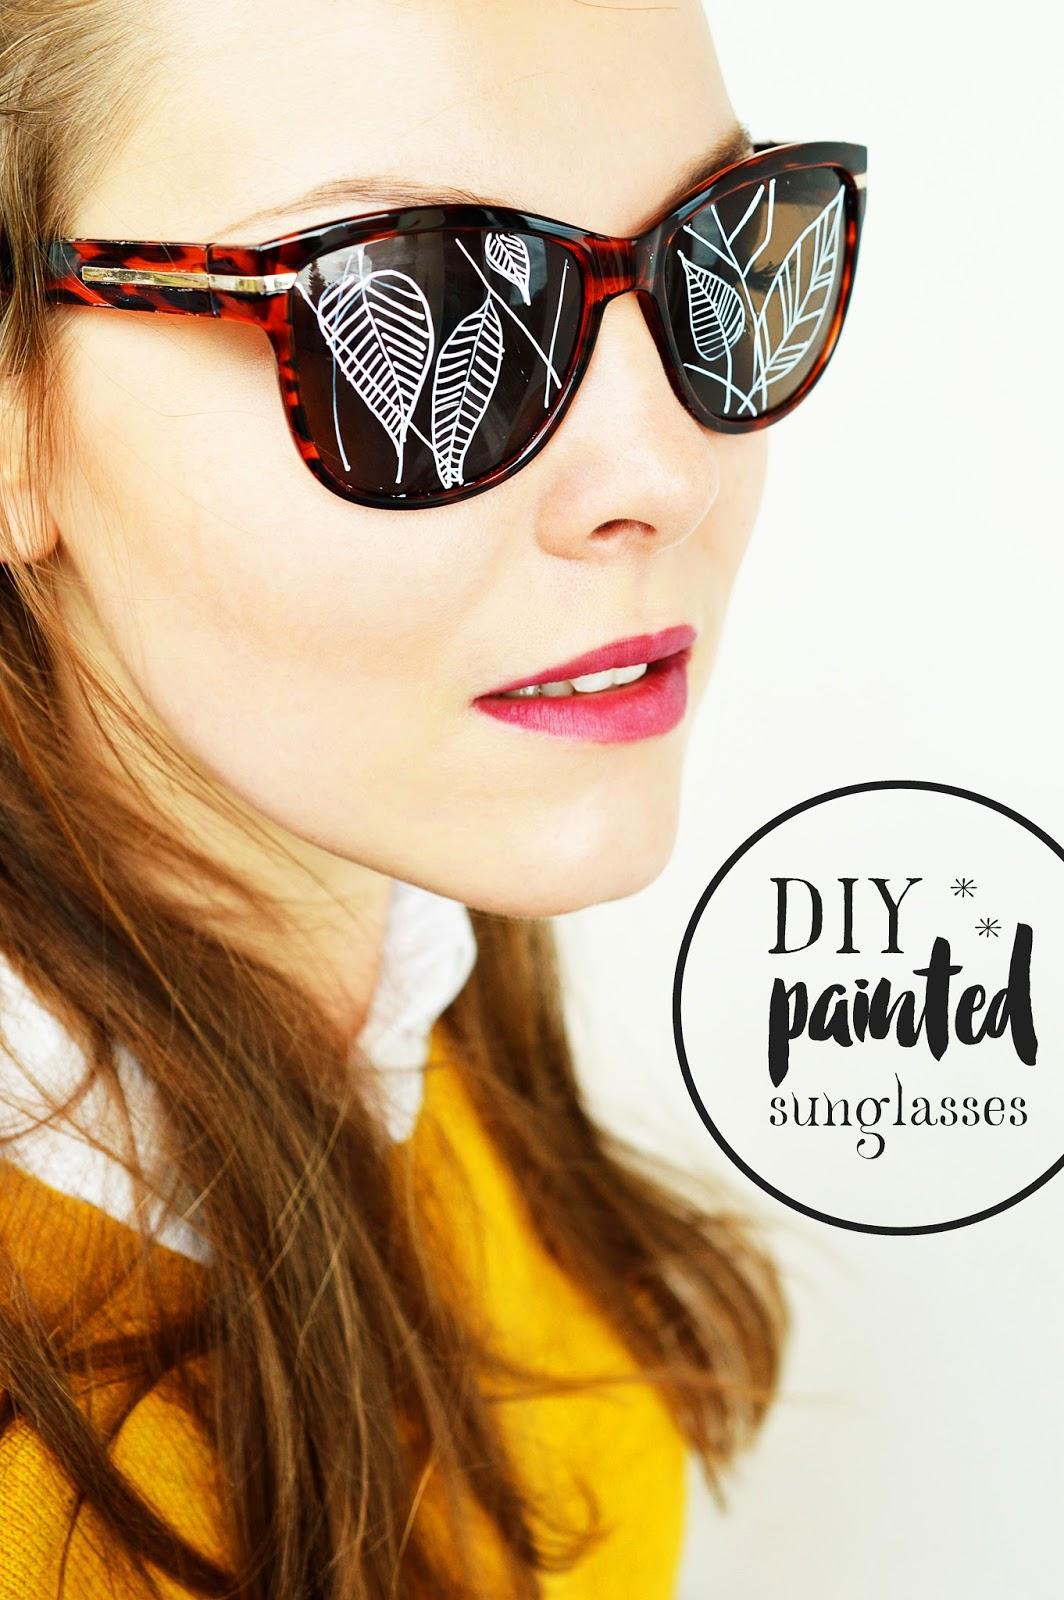 Season's Change | DIY PAINTED SUNGLASSES